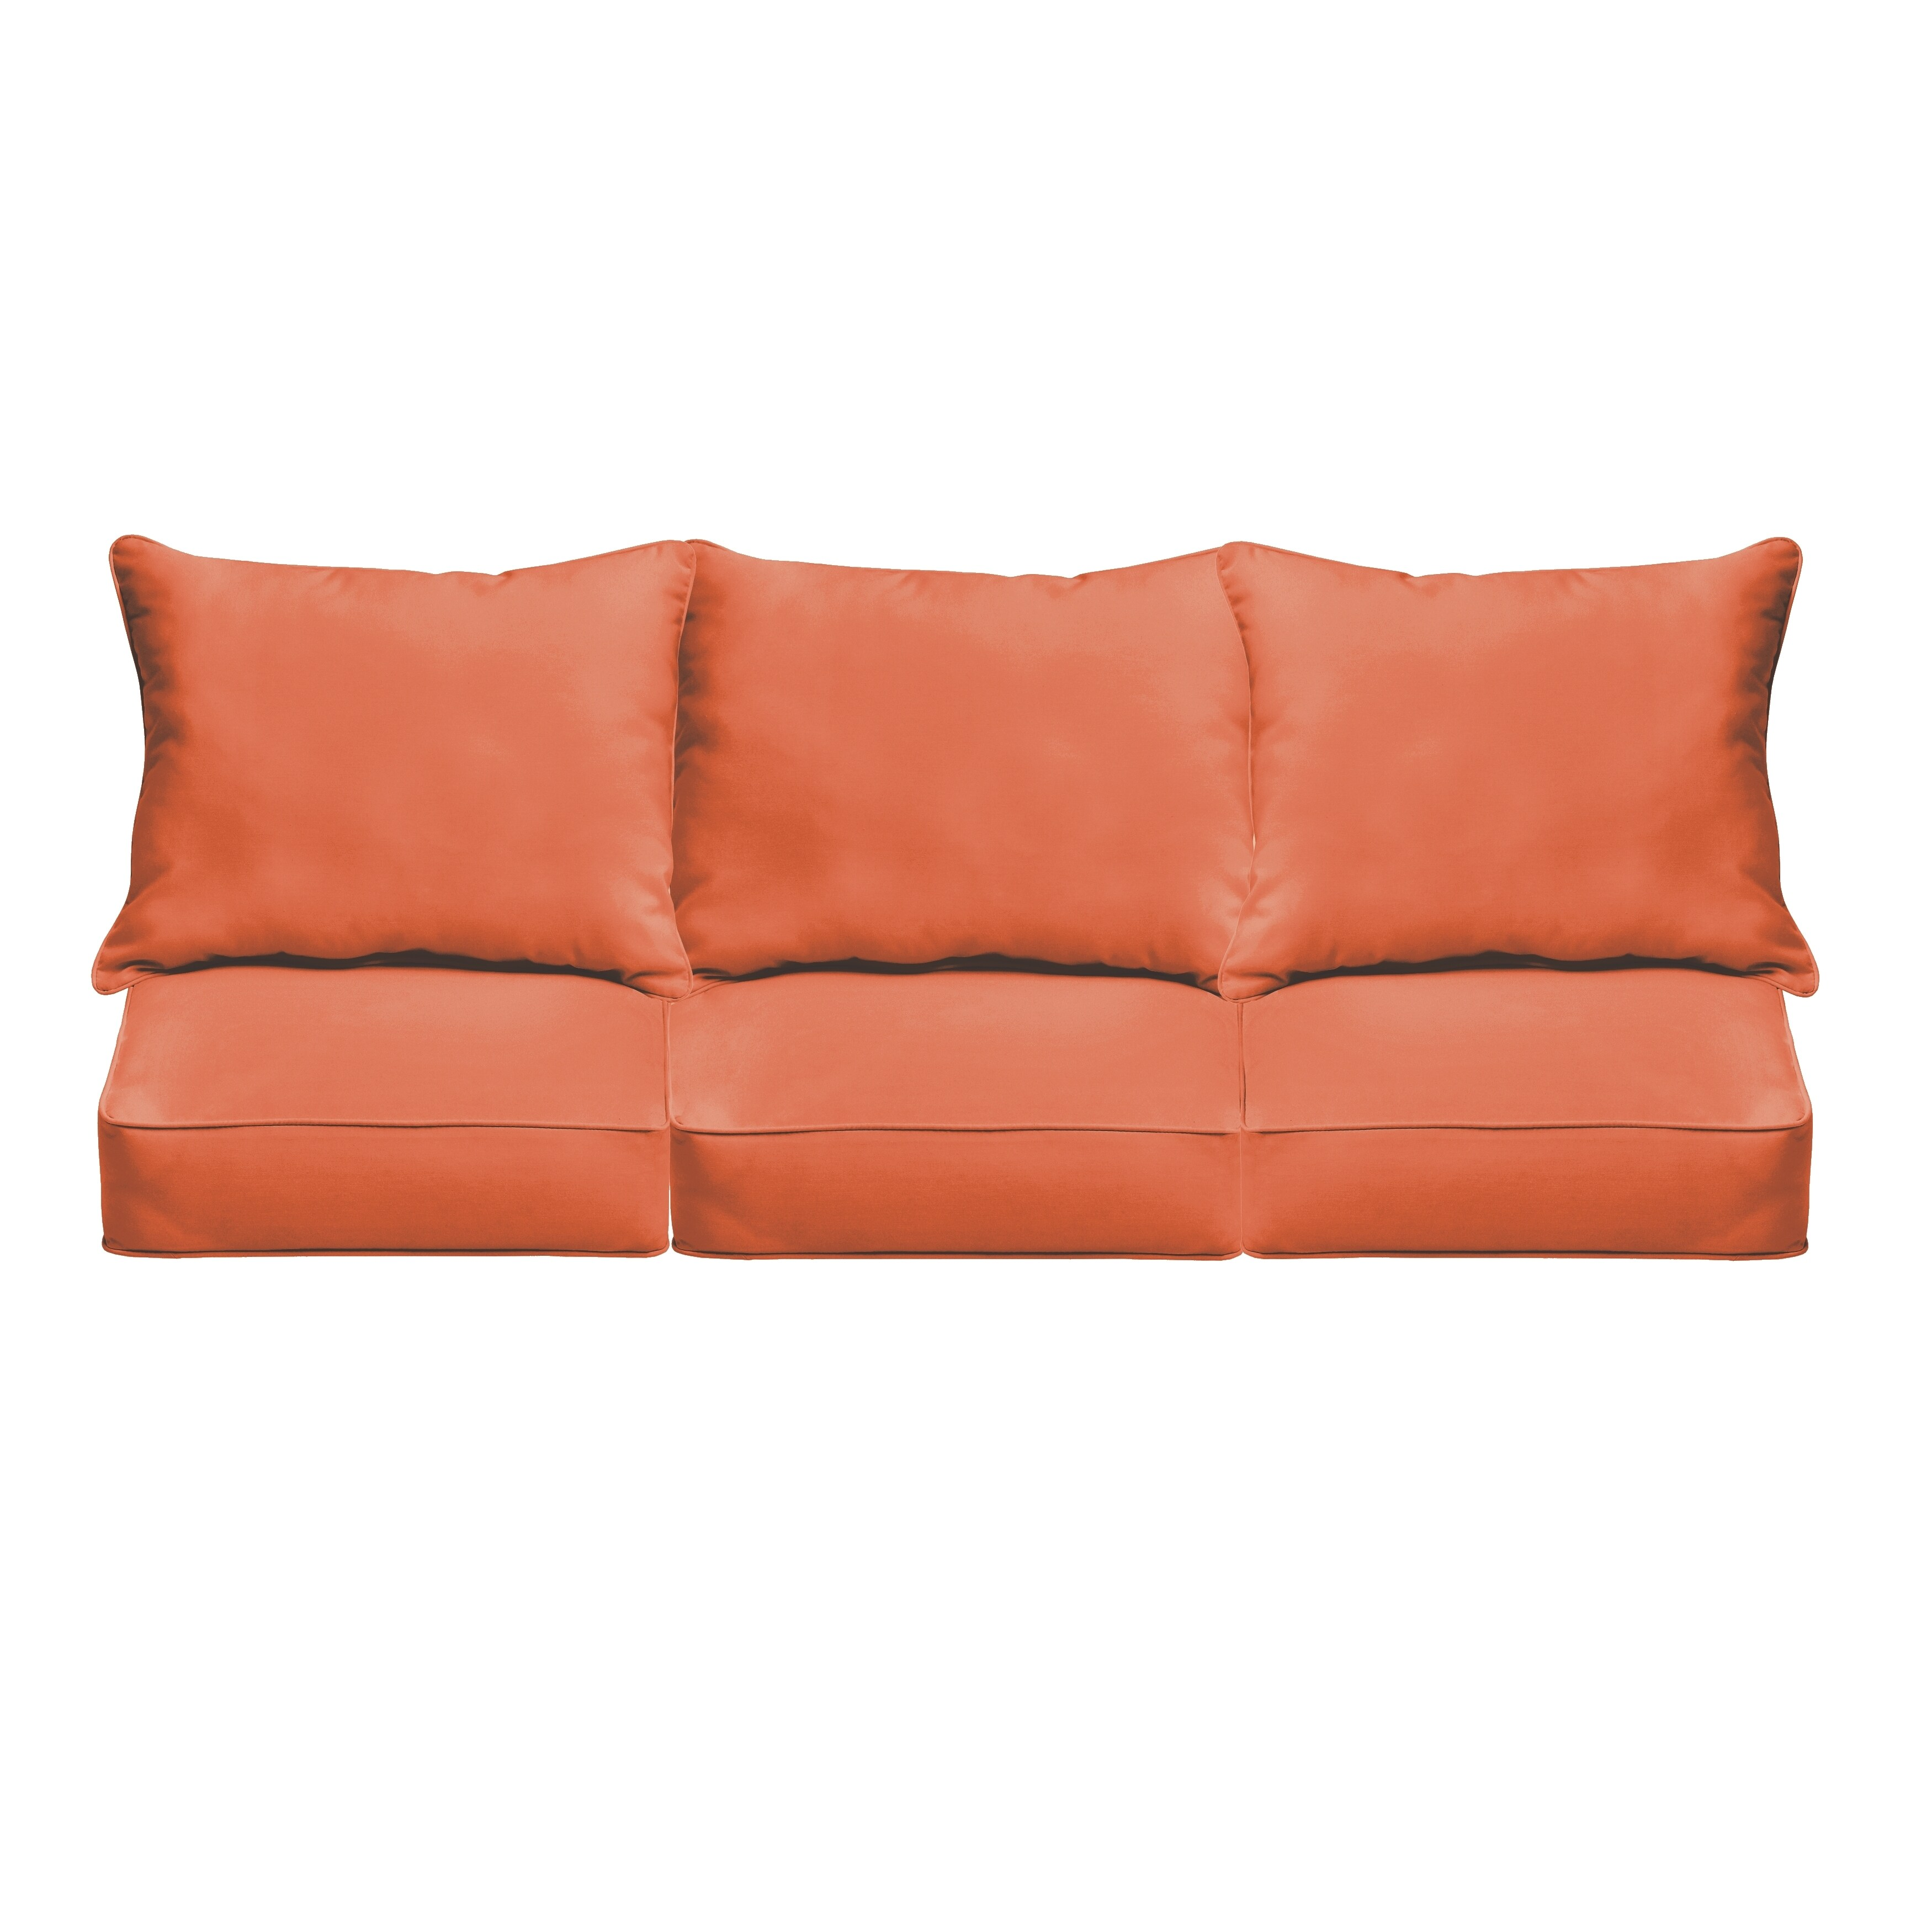 Havenside Home Morgantown Mandarin Orange Indoor/ Outdoor Corded Sofa Cushion Set (OSPCSET4366)